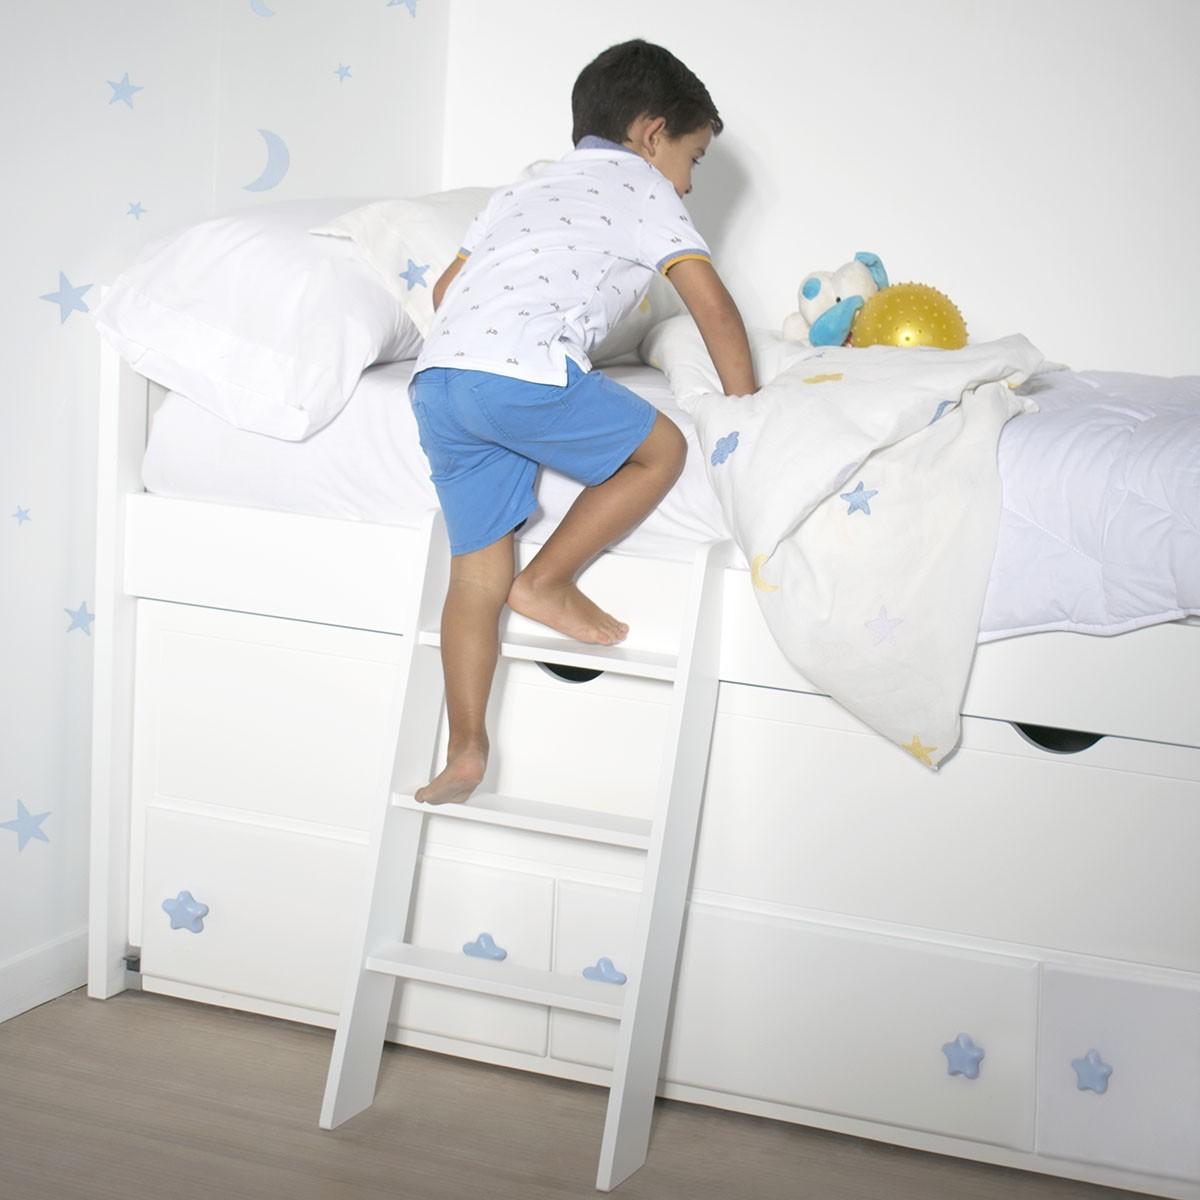 Escalera infantil para camas - Escaleras para camas nido ...